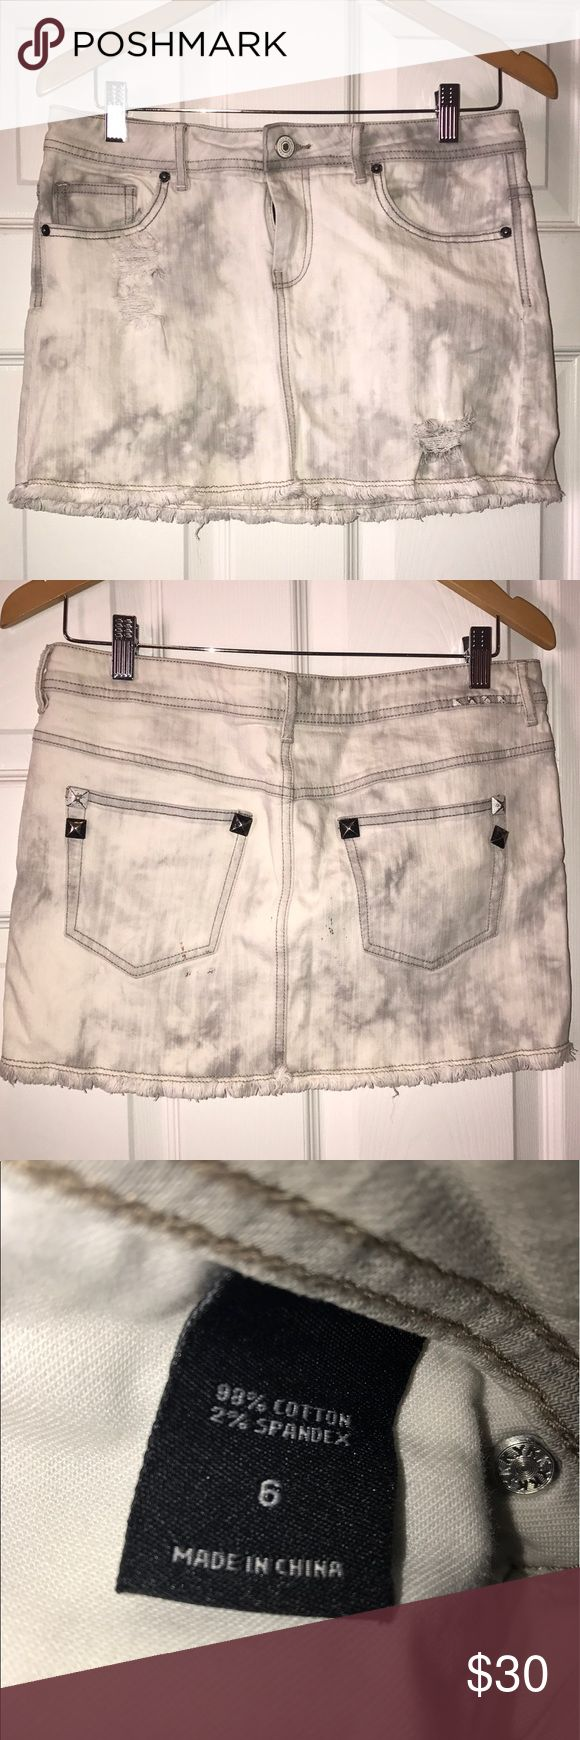 London Jeans (Victoria's Secret) Size 6 Jean Skirt London Jeans (by Victoria's Secret) size 6 white/grey destroyed/distressed mini skirt. london jeans Skirts Mini